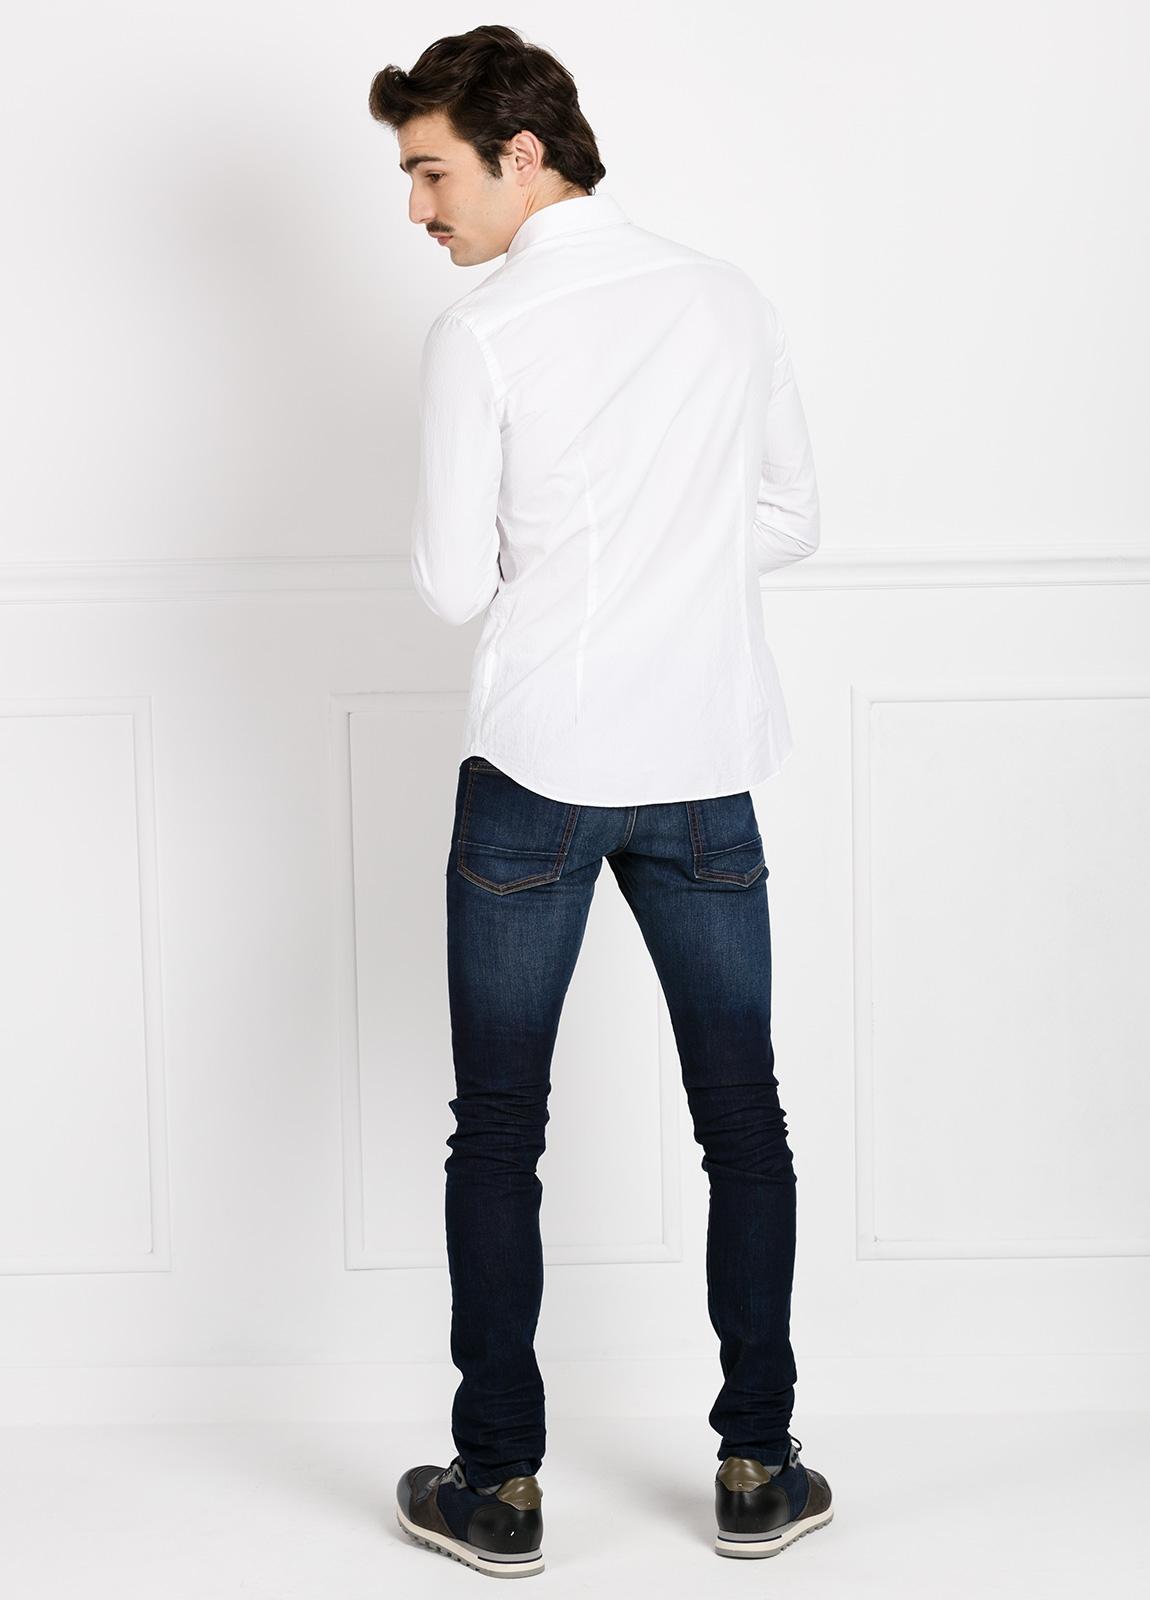 Camisa Leisure Wear SLIM FIT Modelo CAPRI color blanco micrograbado. 100% Algodón. - Ítem1